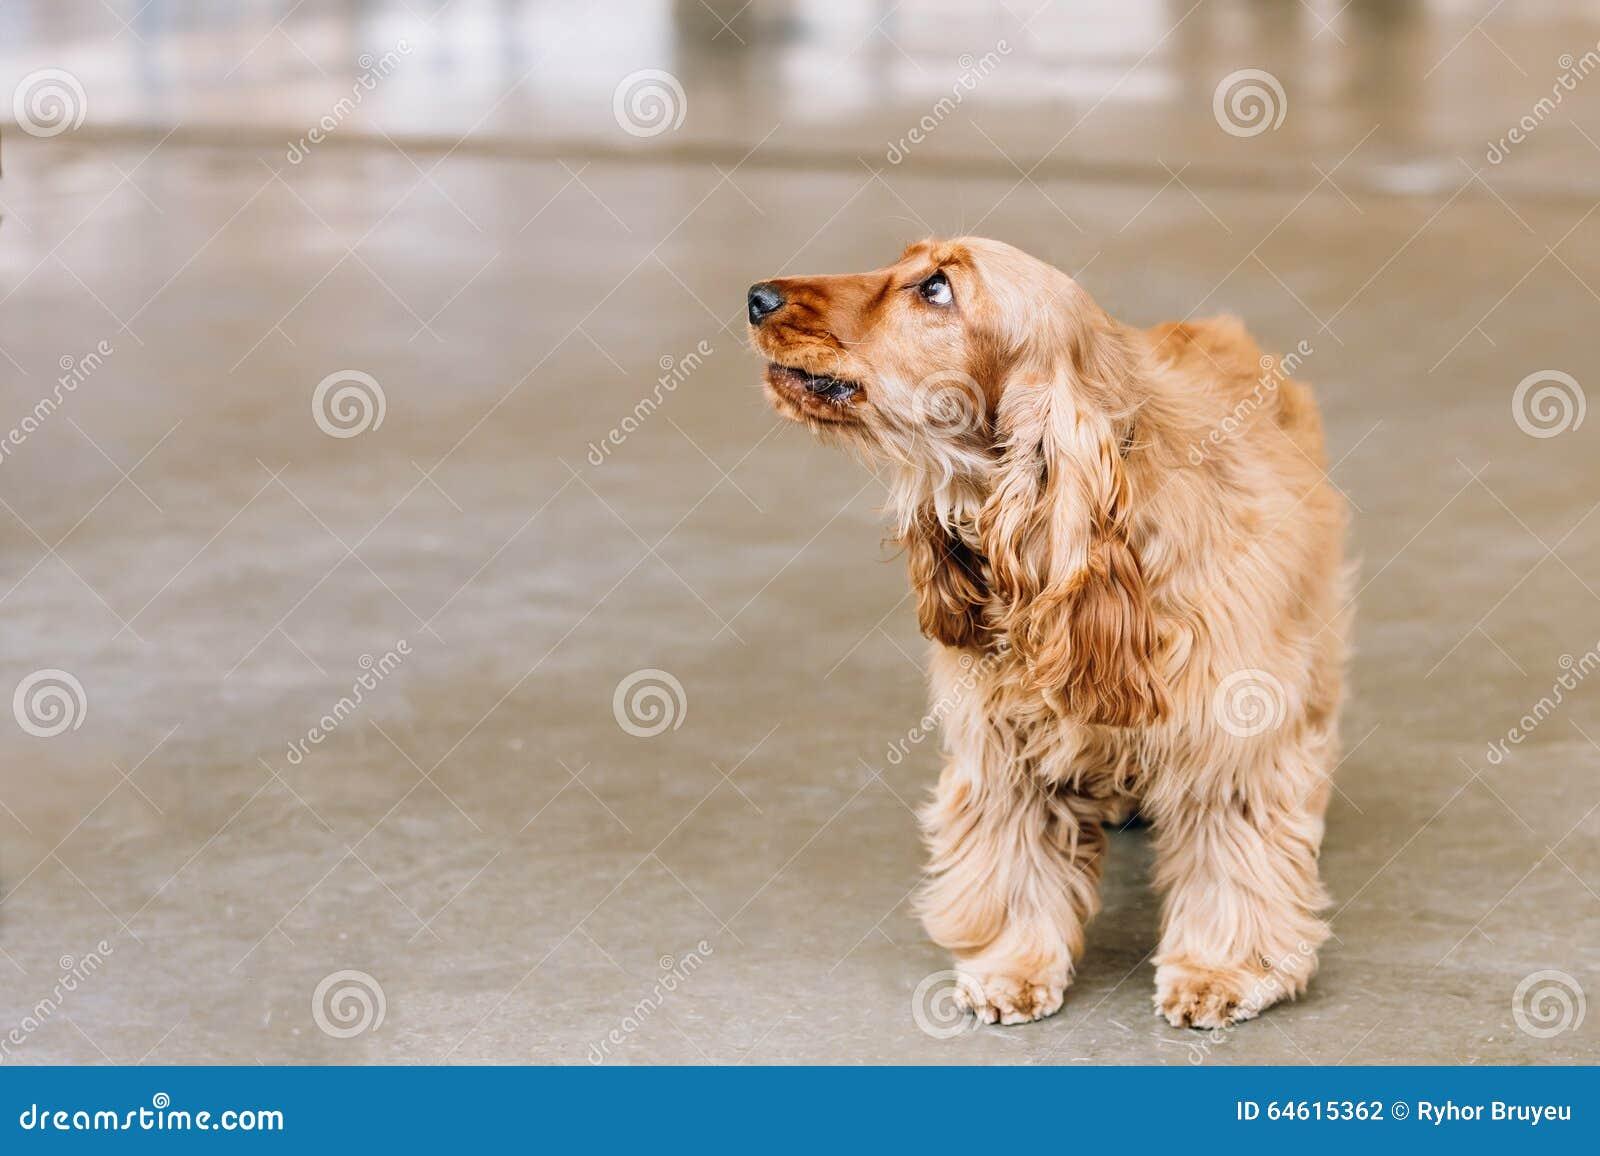 Brown English Cocker Spaniel Dog Indoor Stock Photo ...